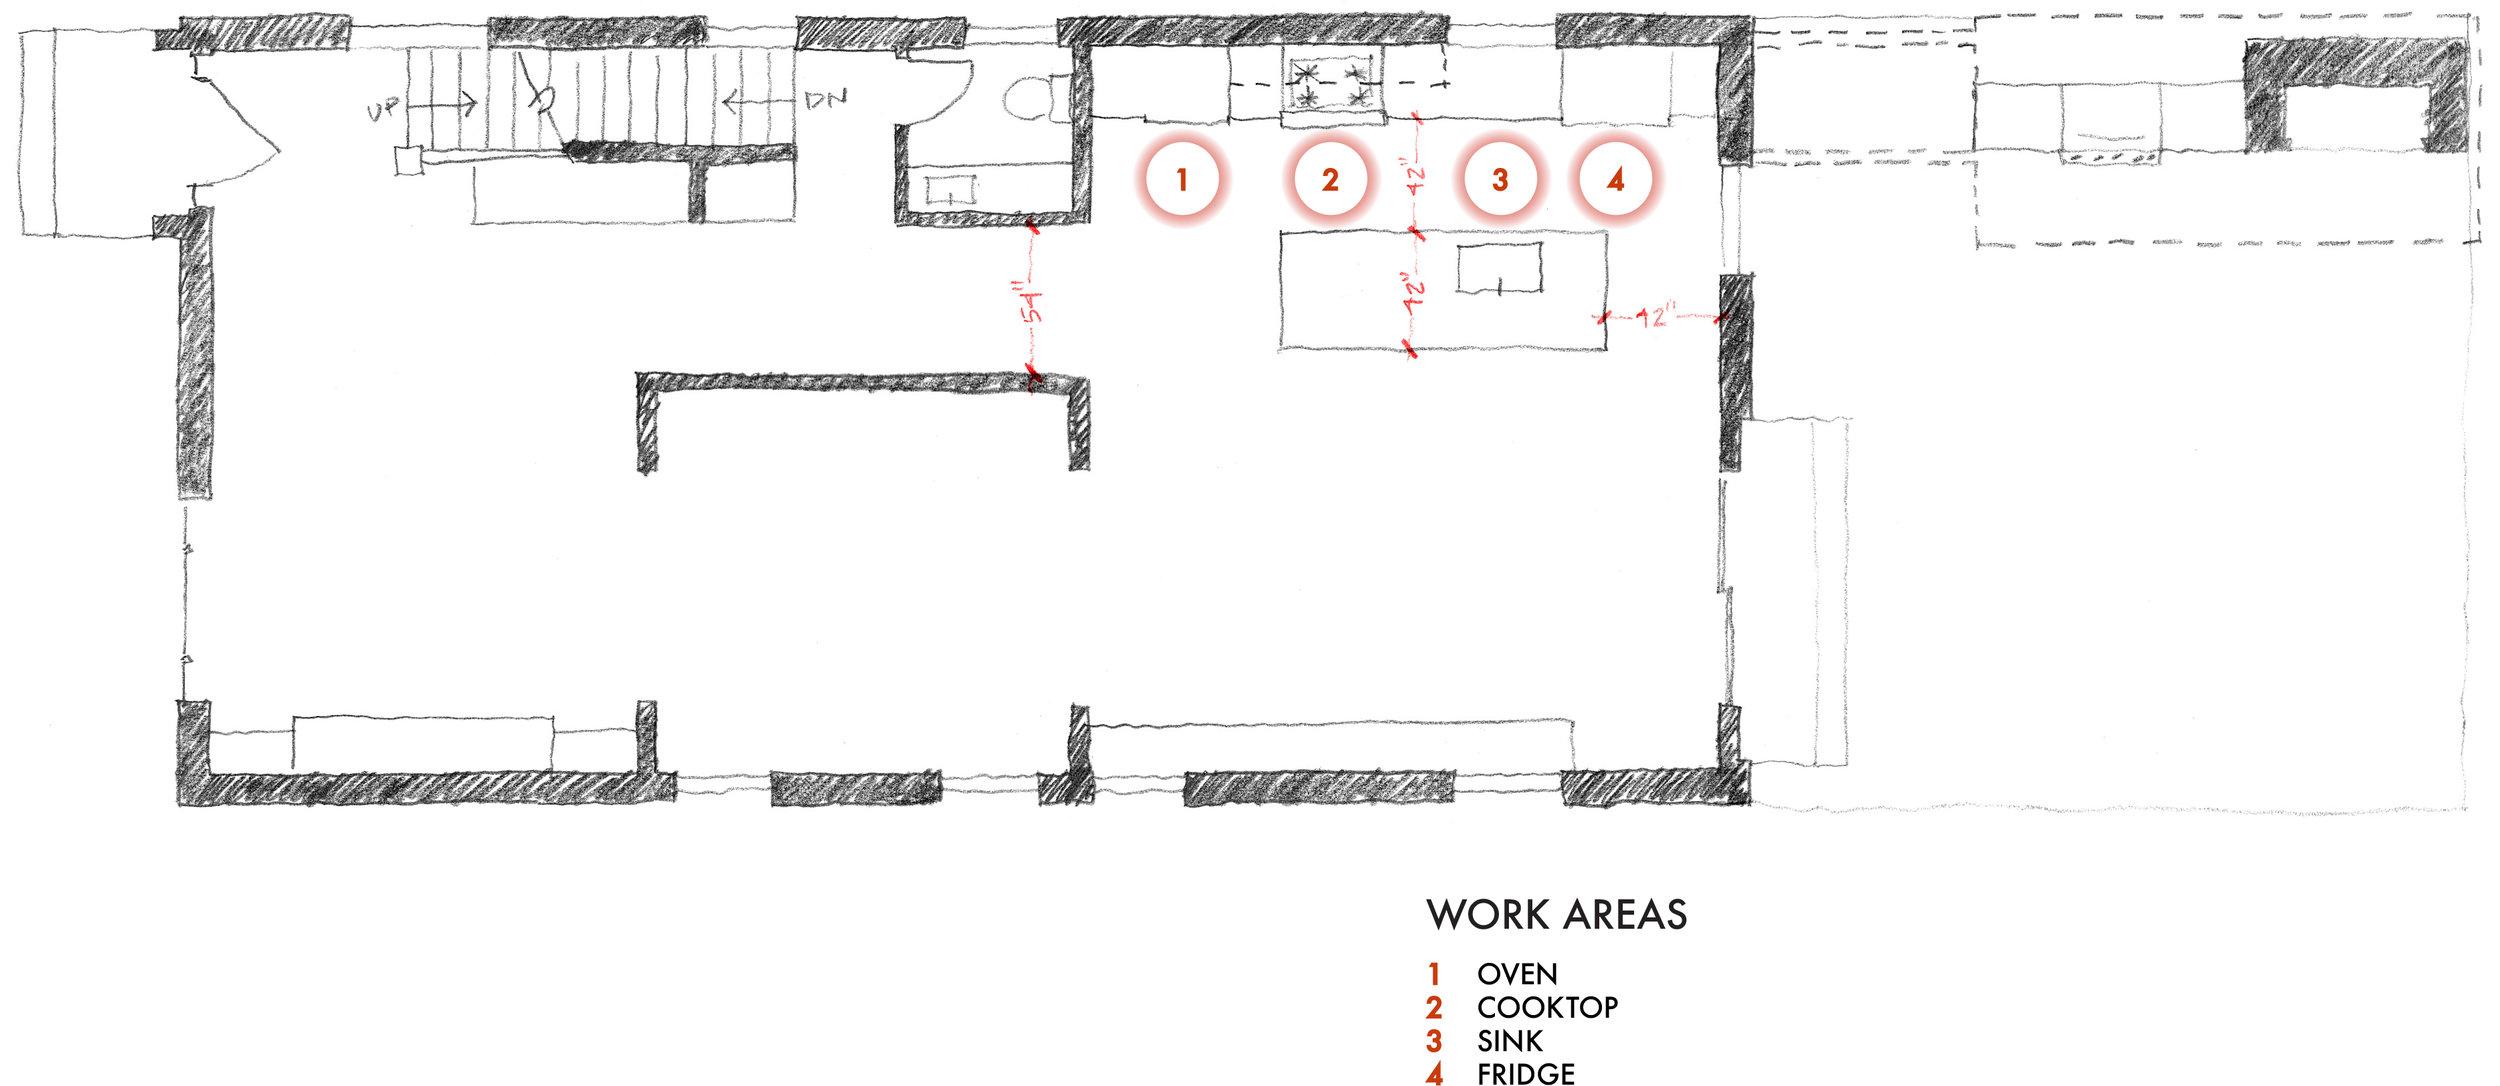 Queen Anne House Work Area Diagram.jpg